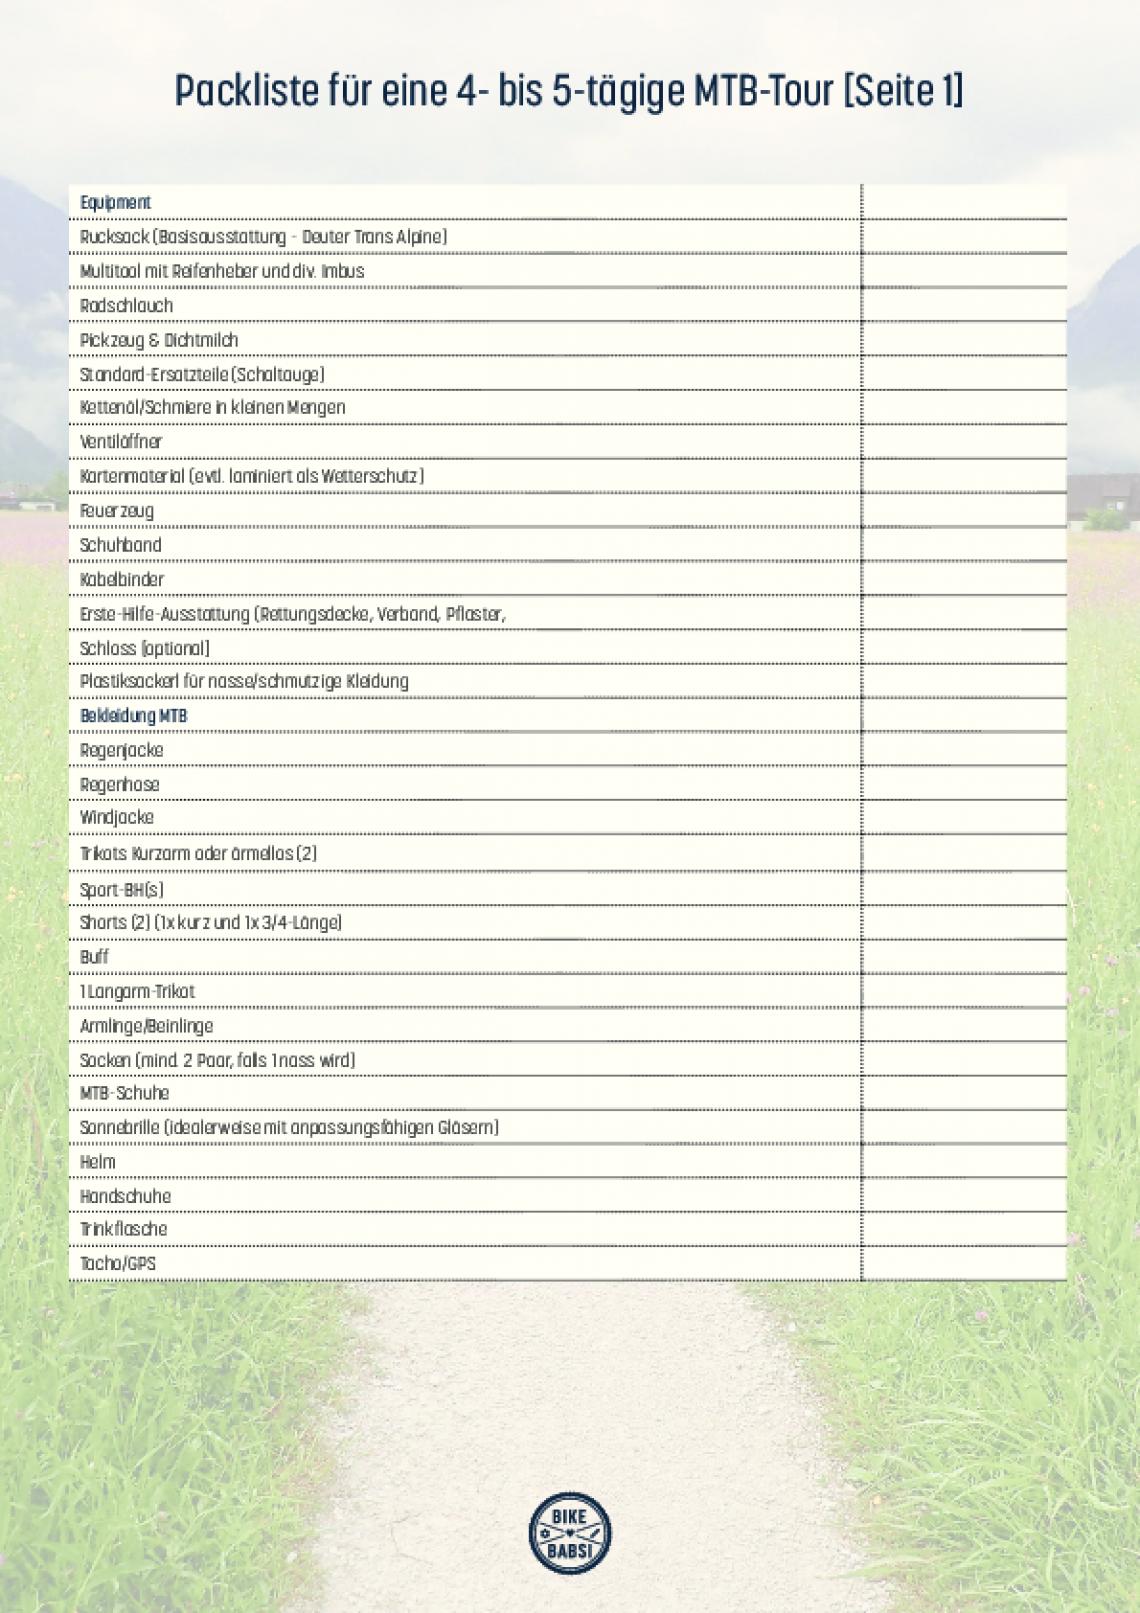 mehrtagestour-packliste.pdf